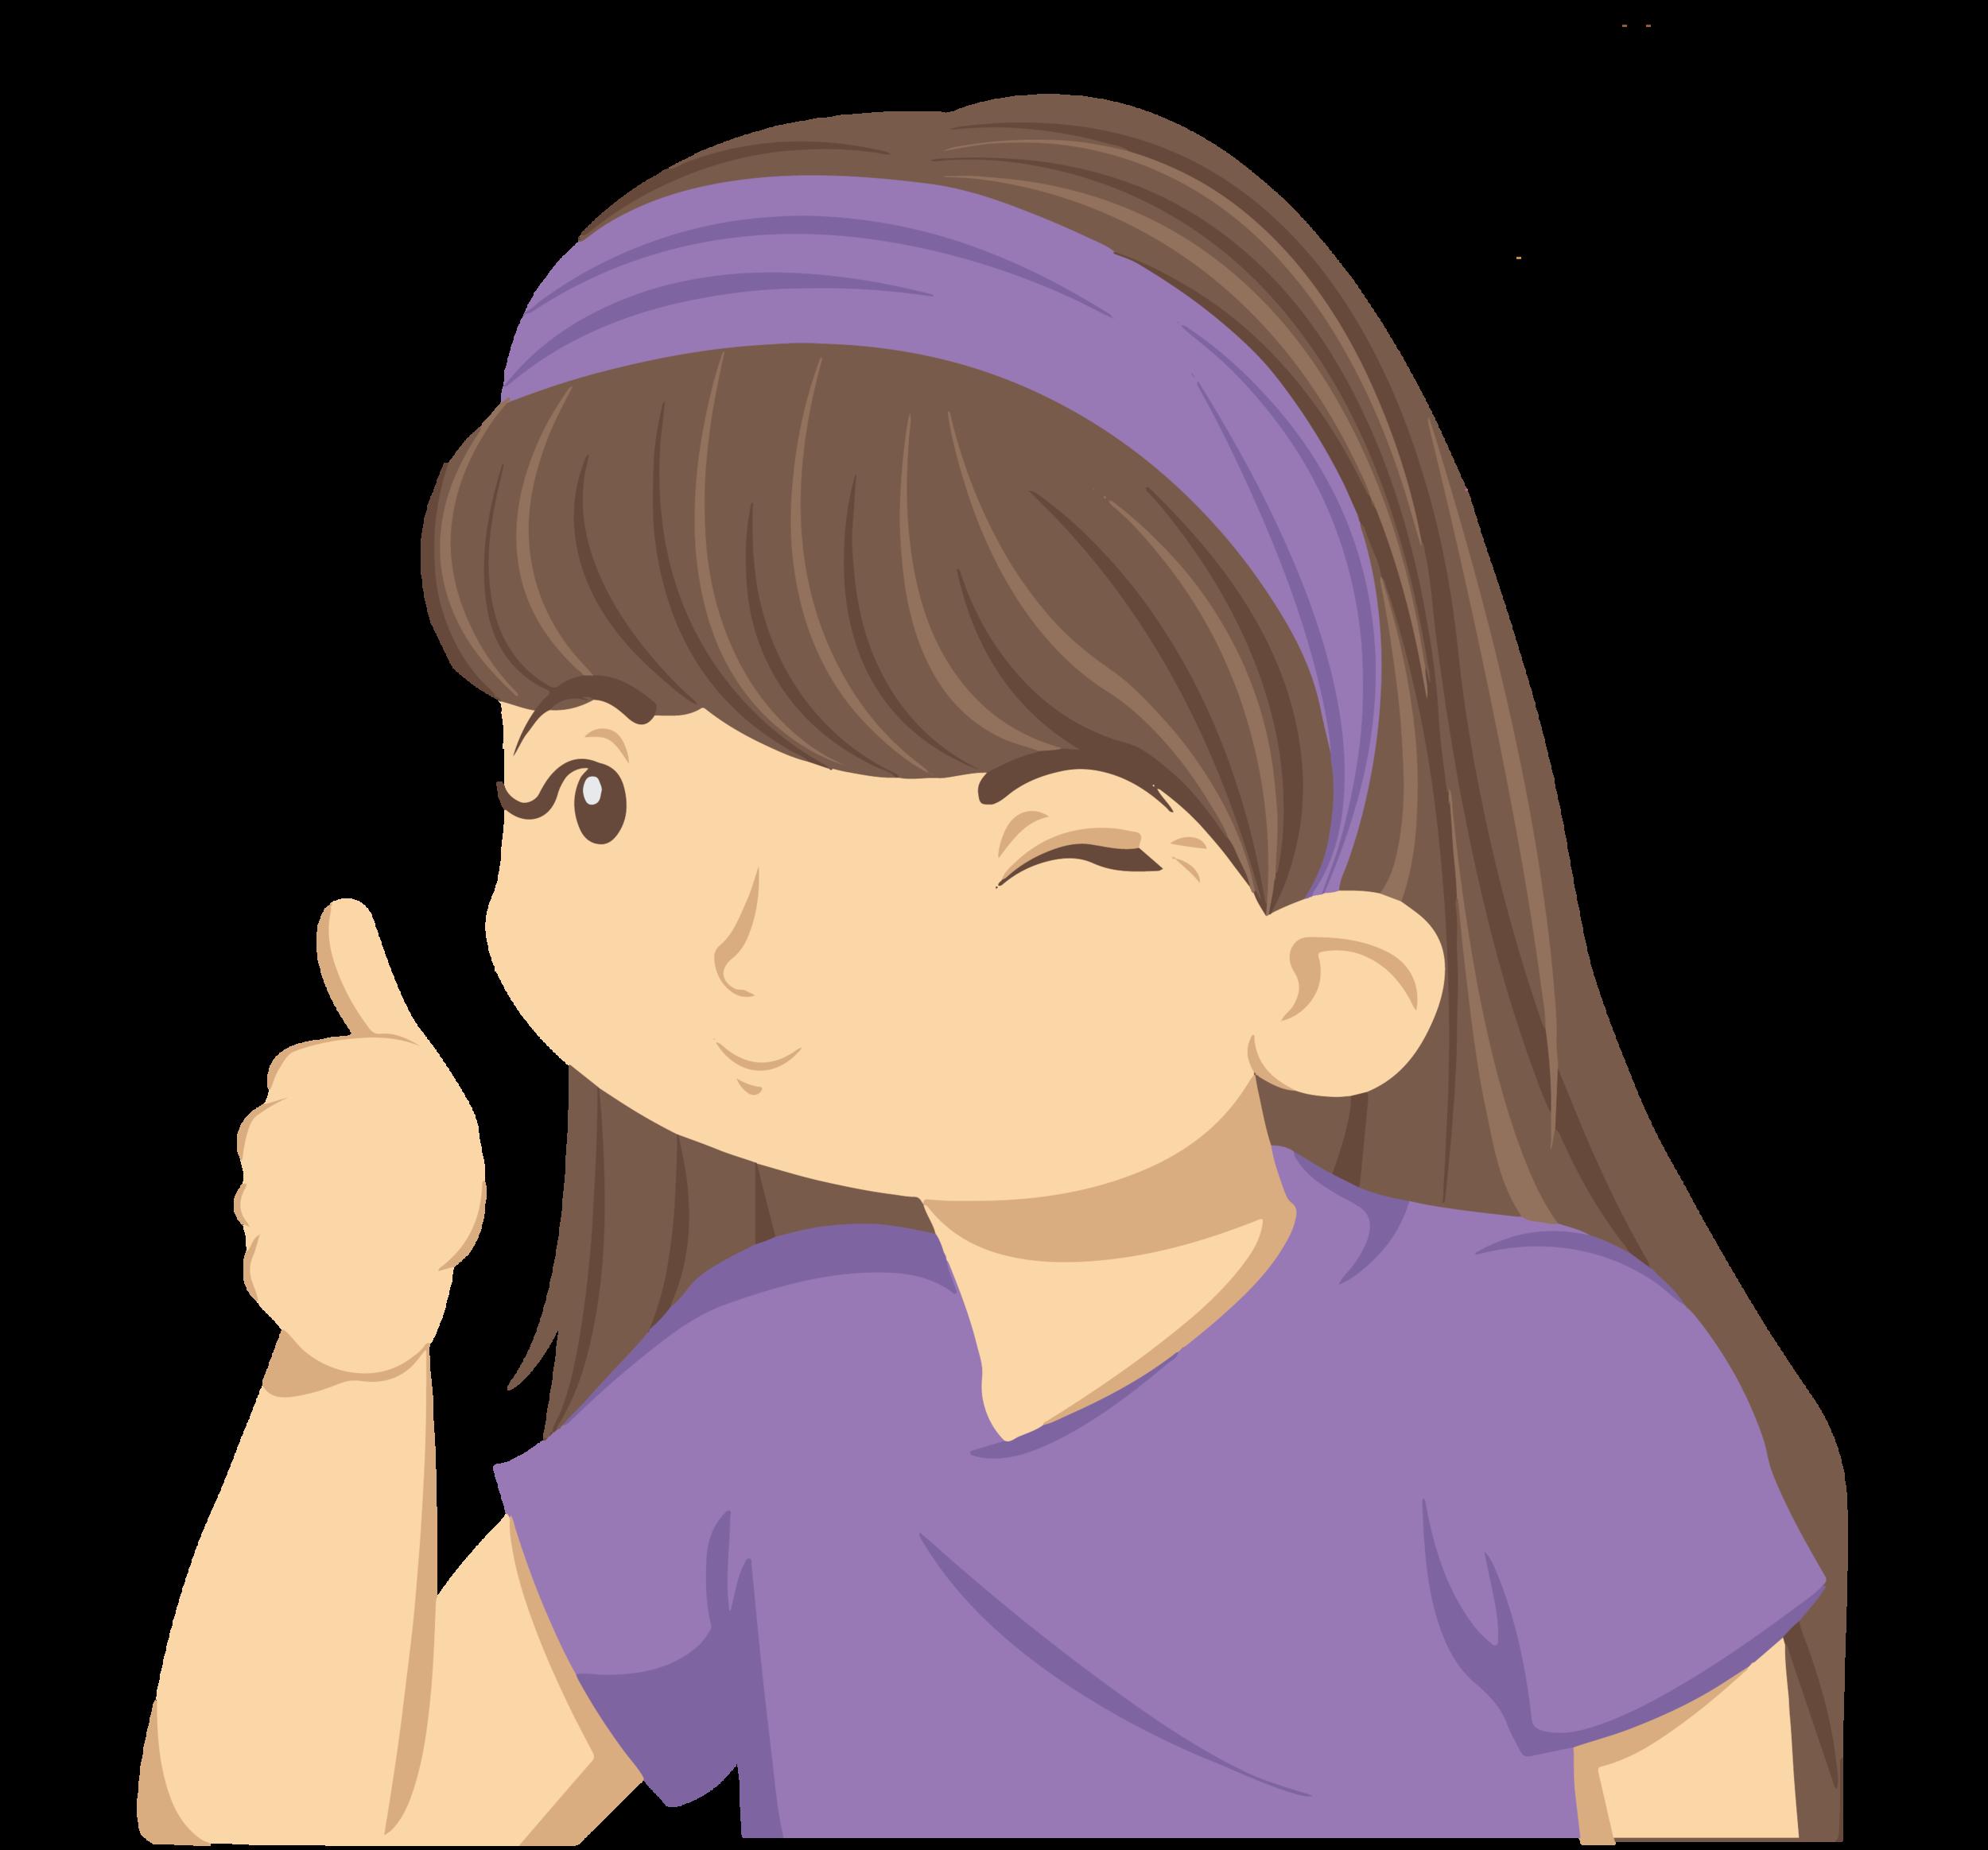 Let's Chat Books Illustration of Girl